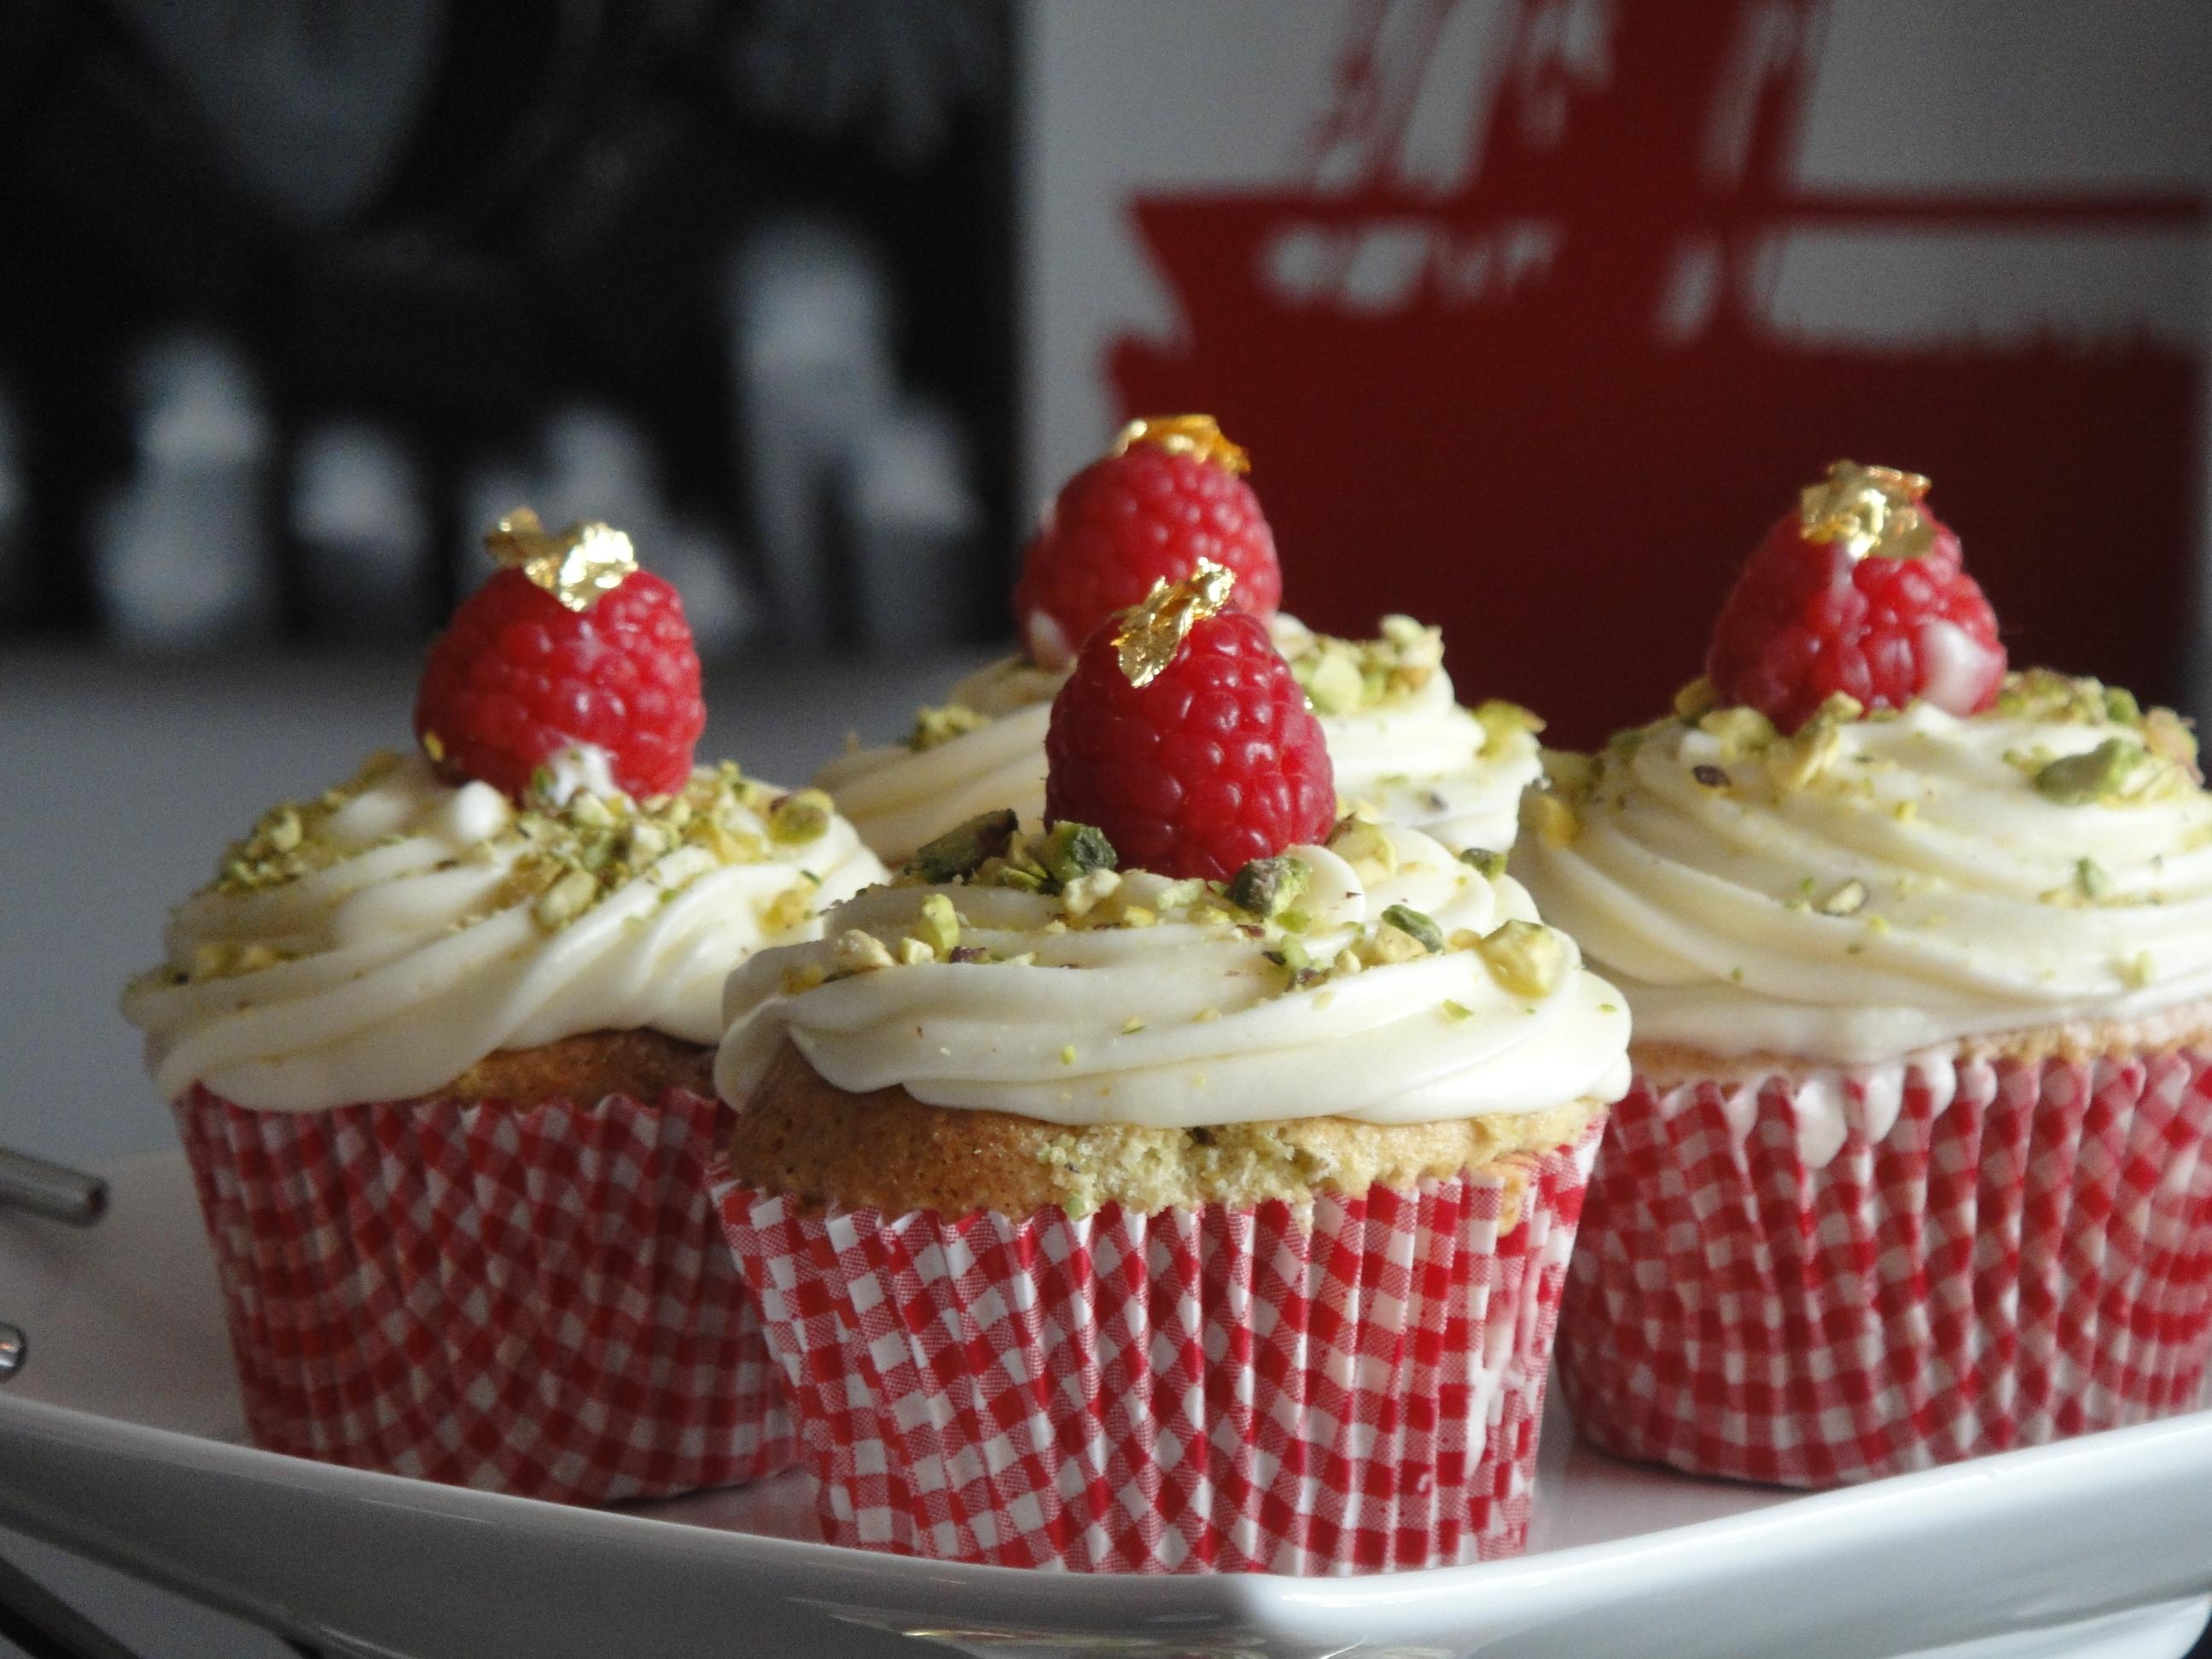 Pistachio Cupcakes With Raspberries Recipes — Dishmaps